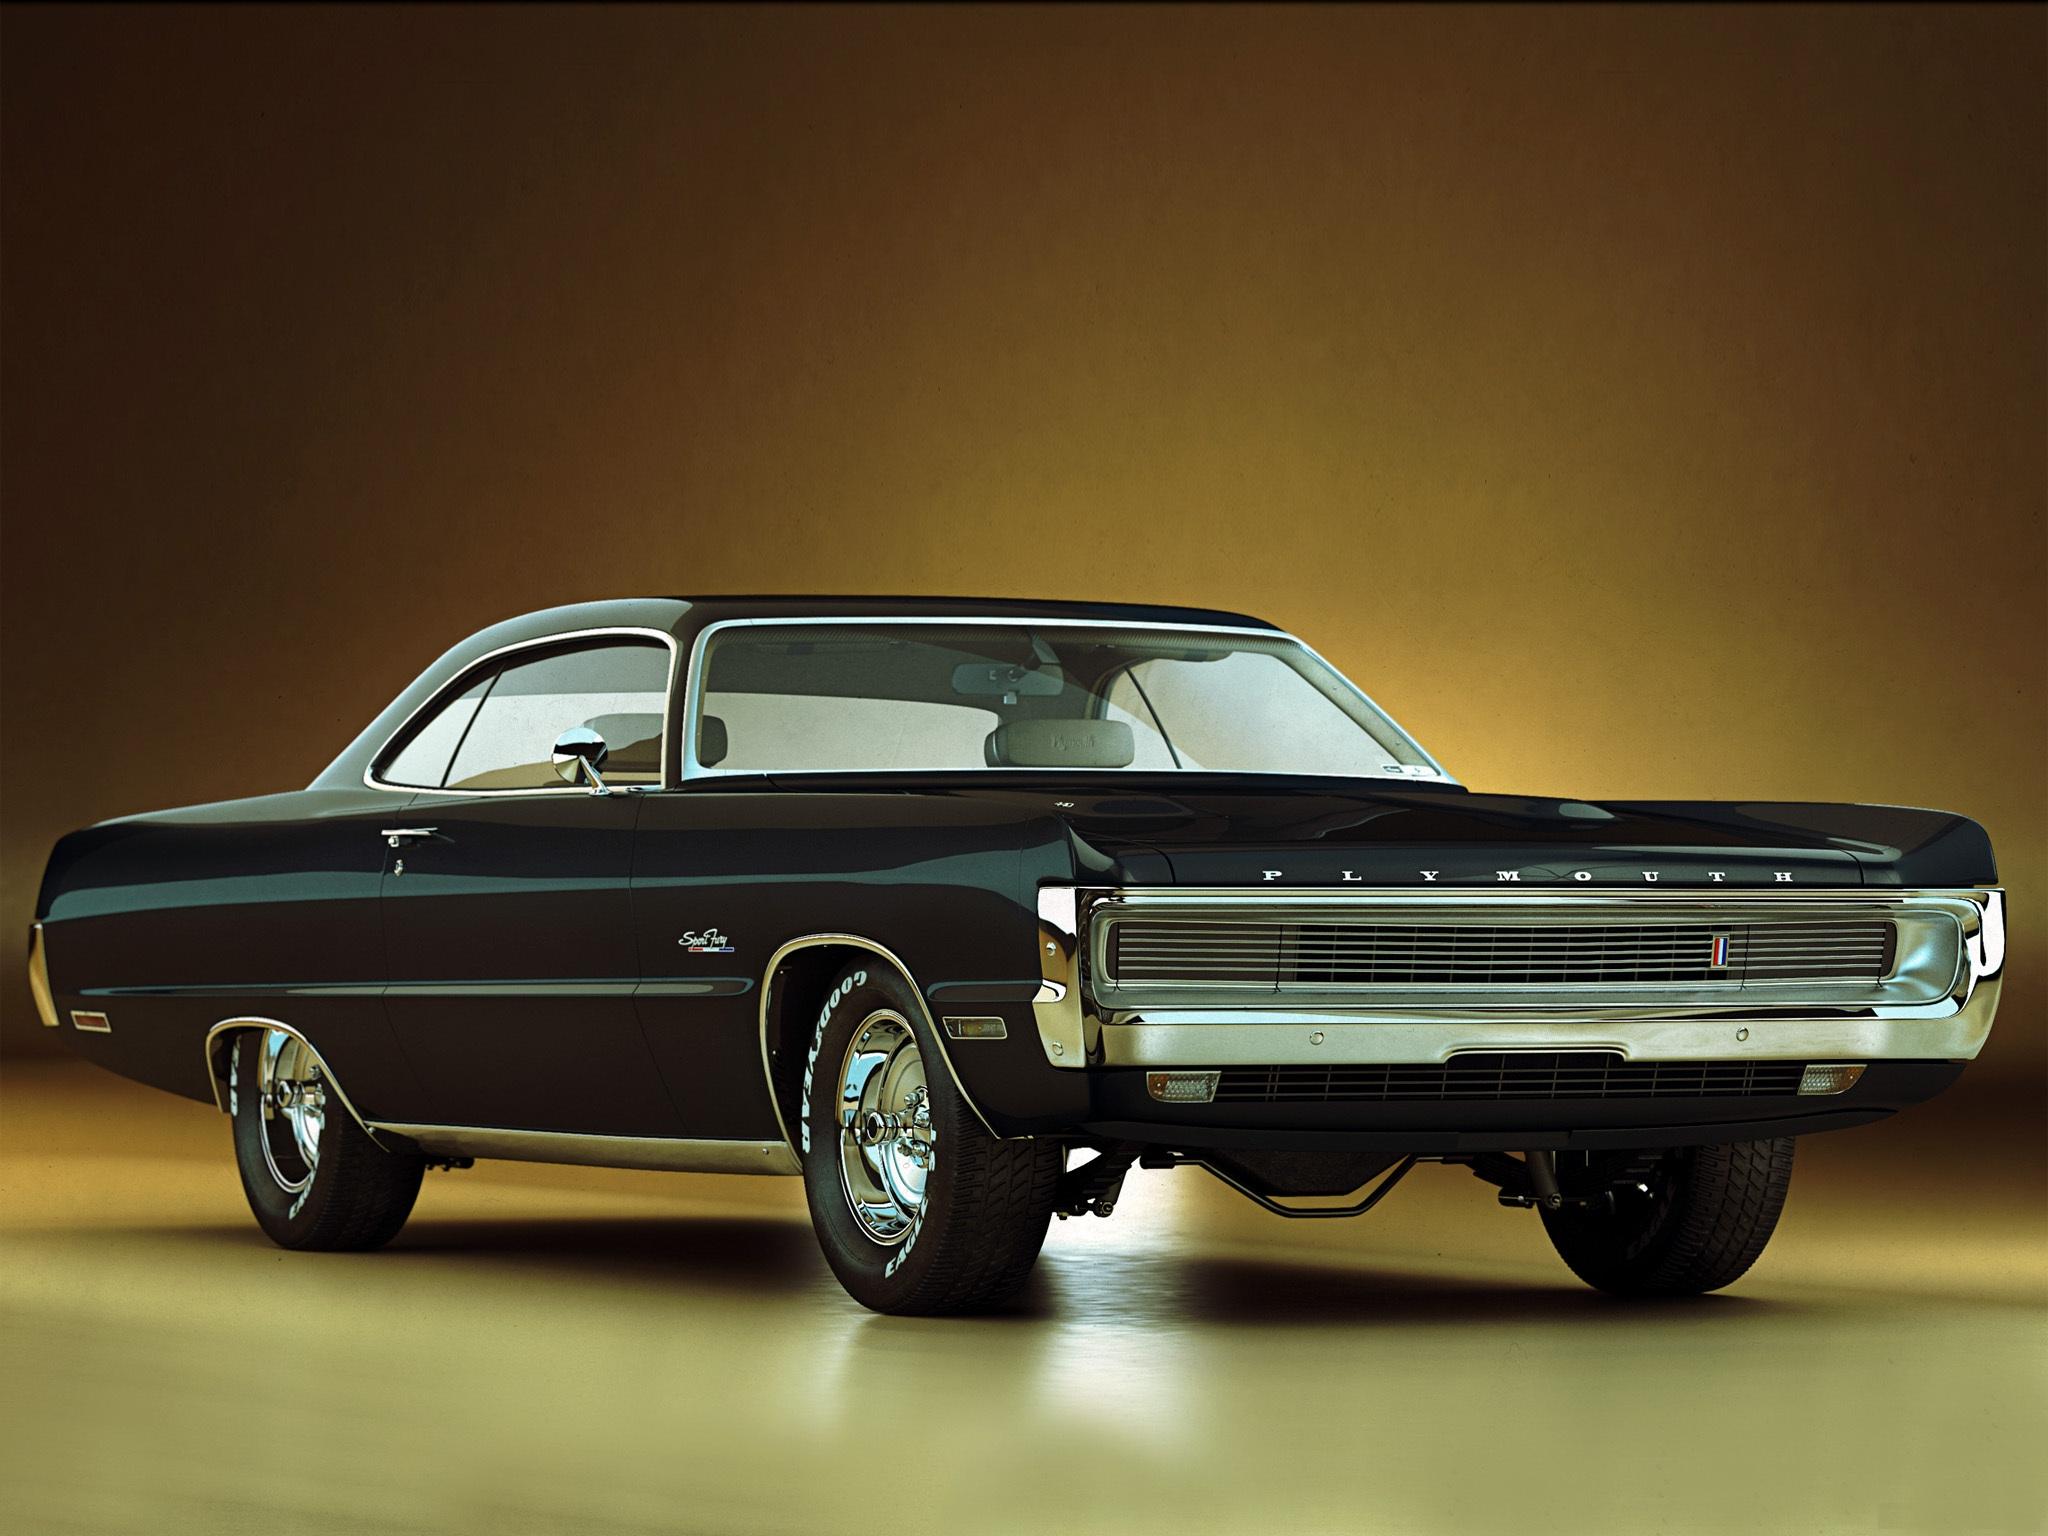 1970 Plymouth Fury mopar classic muscle cars wallpaper | 2048x1536 ...